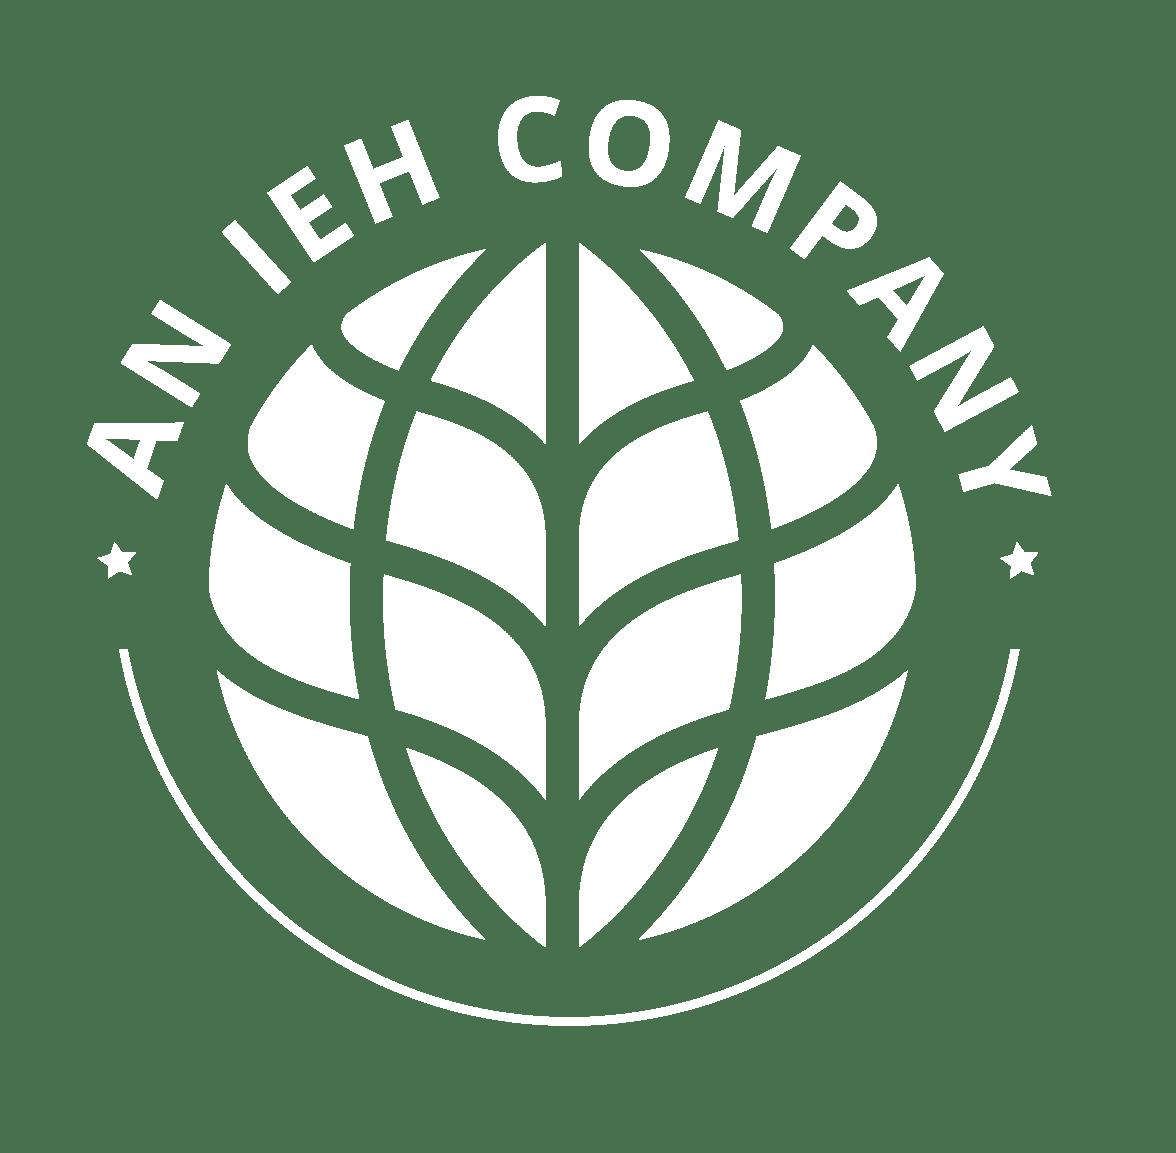 An IEH company logo